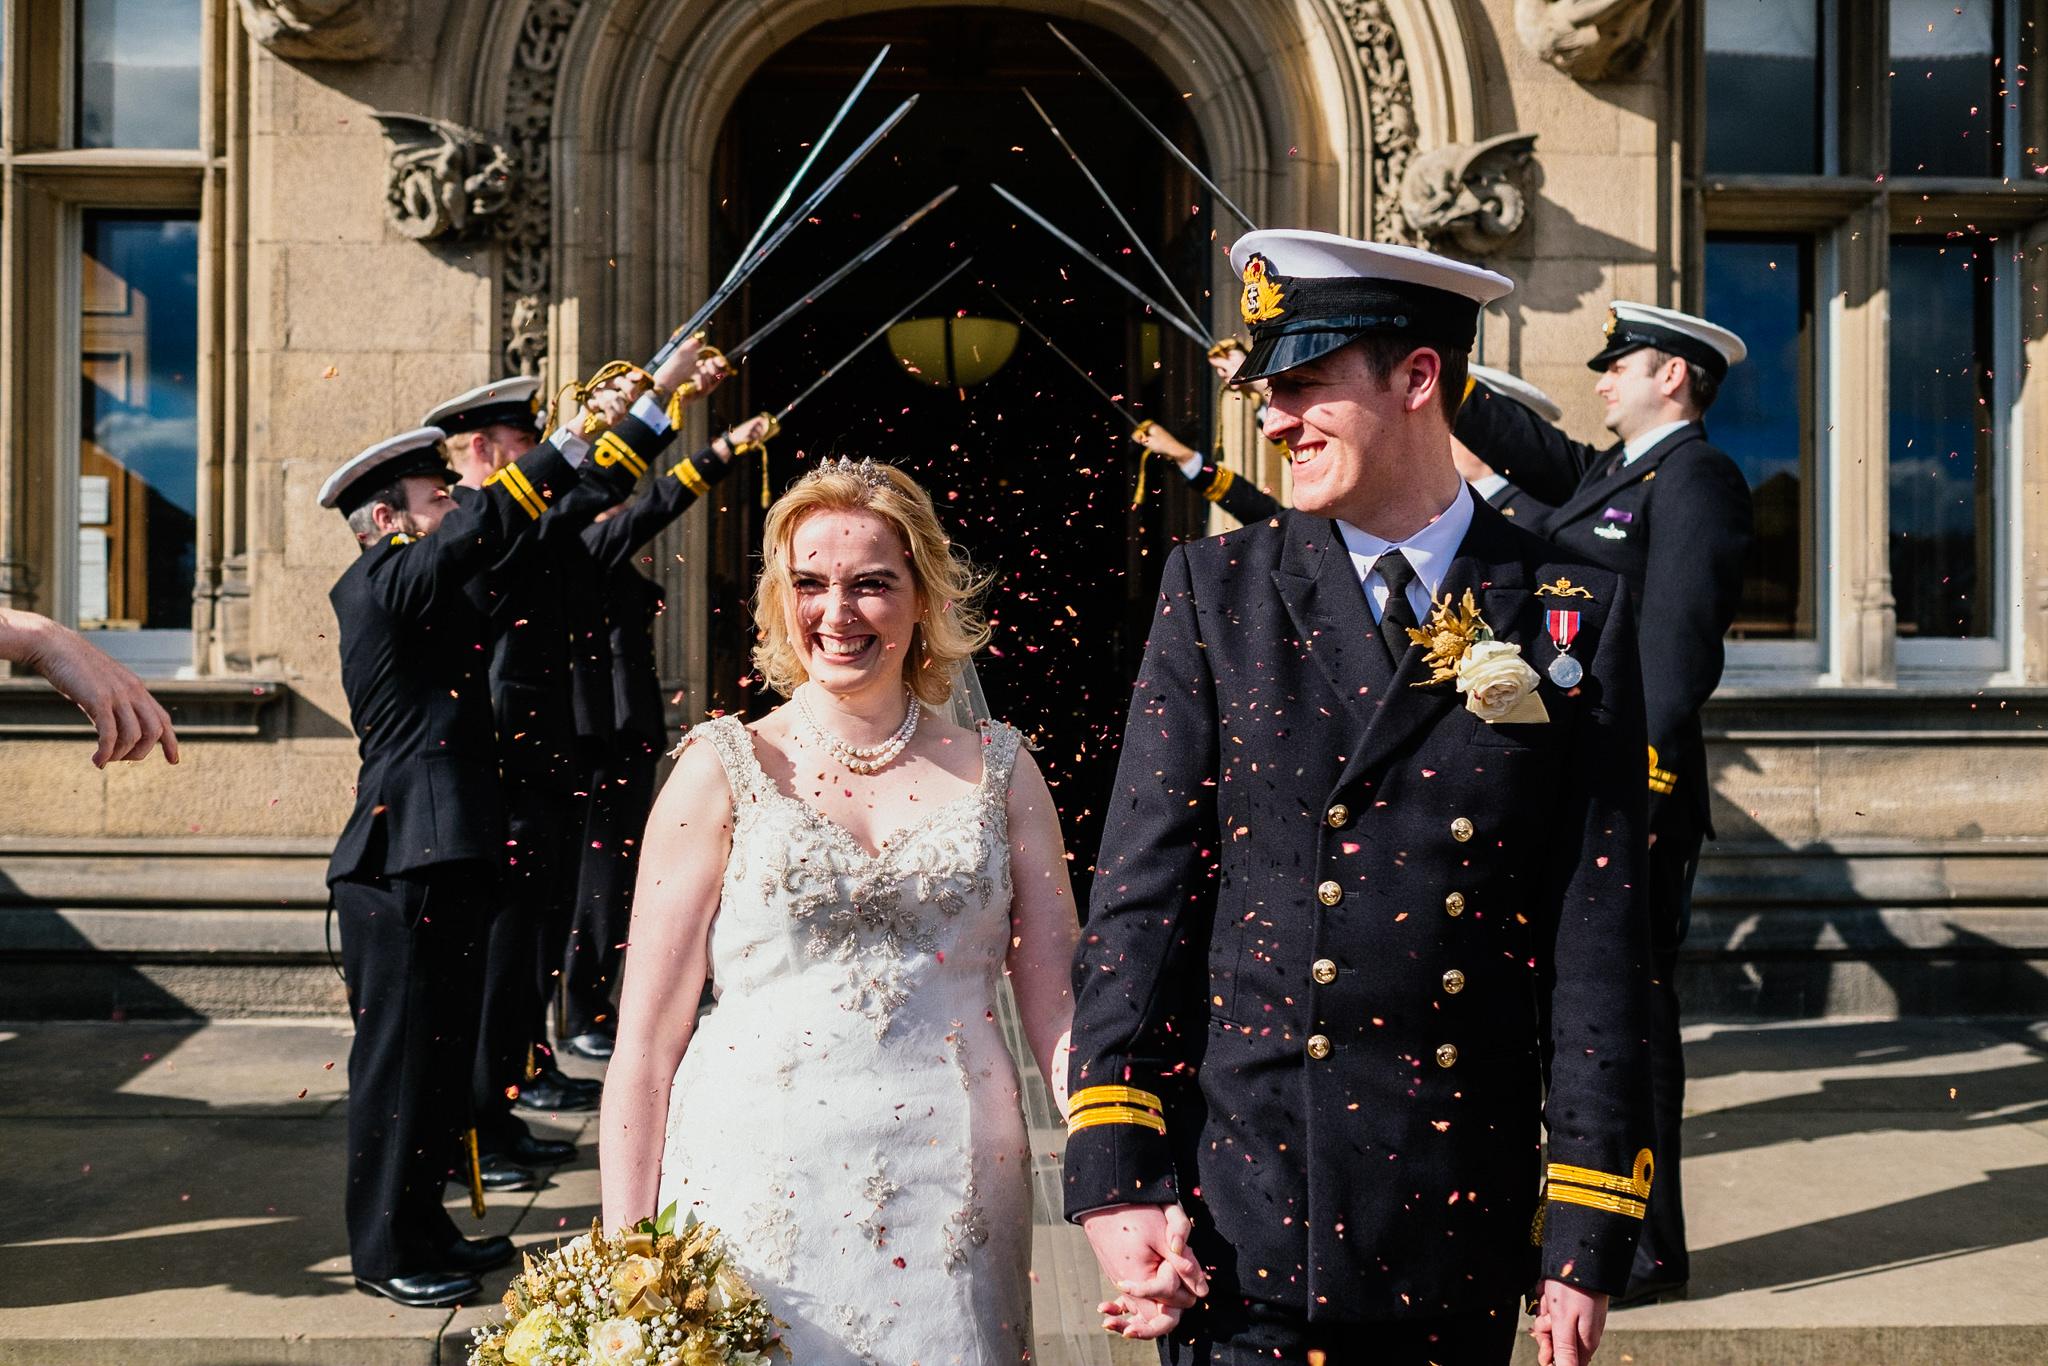 Edinburgh Wedding Photographer_Euan Robertson Photography_006.jpg